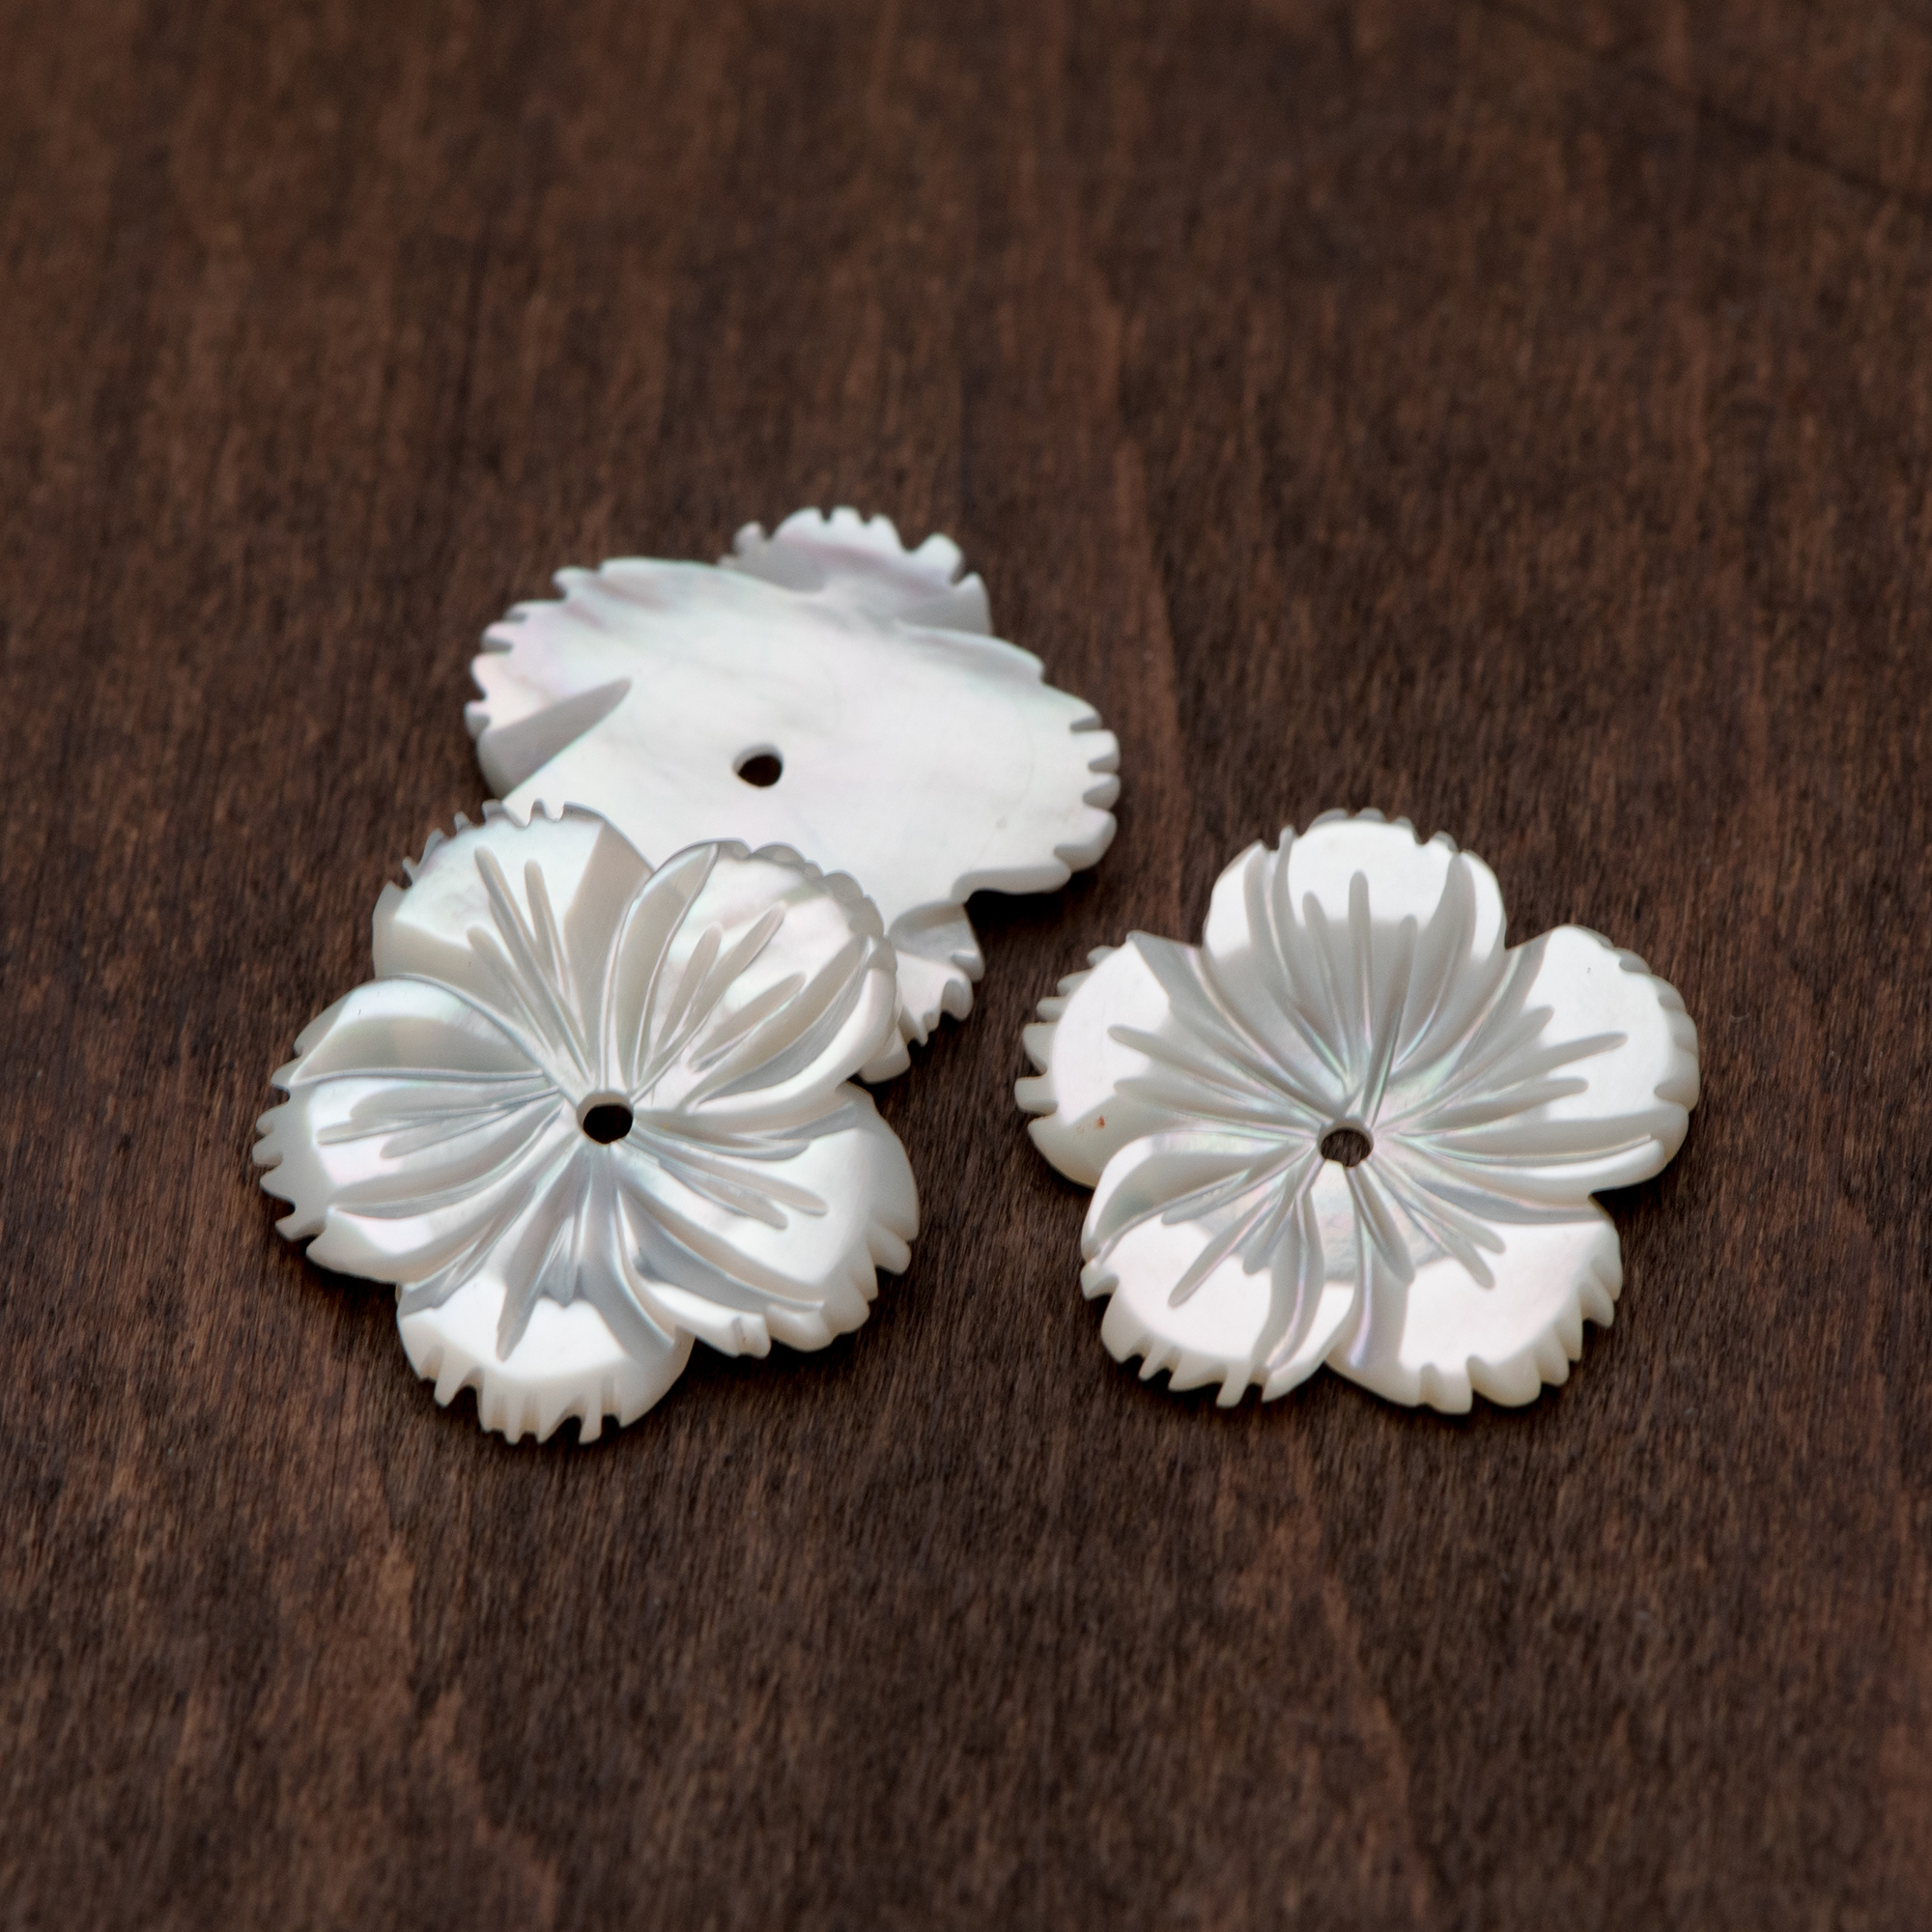 15mm White Shell Flower bead Natural MOP Shell Flower beads,hand carved flower beads,100pcs